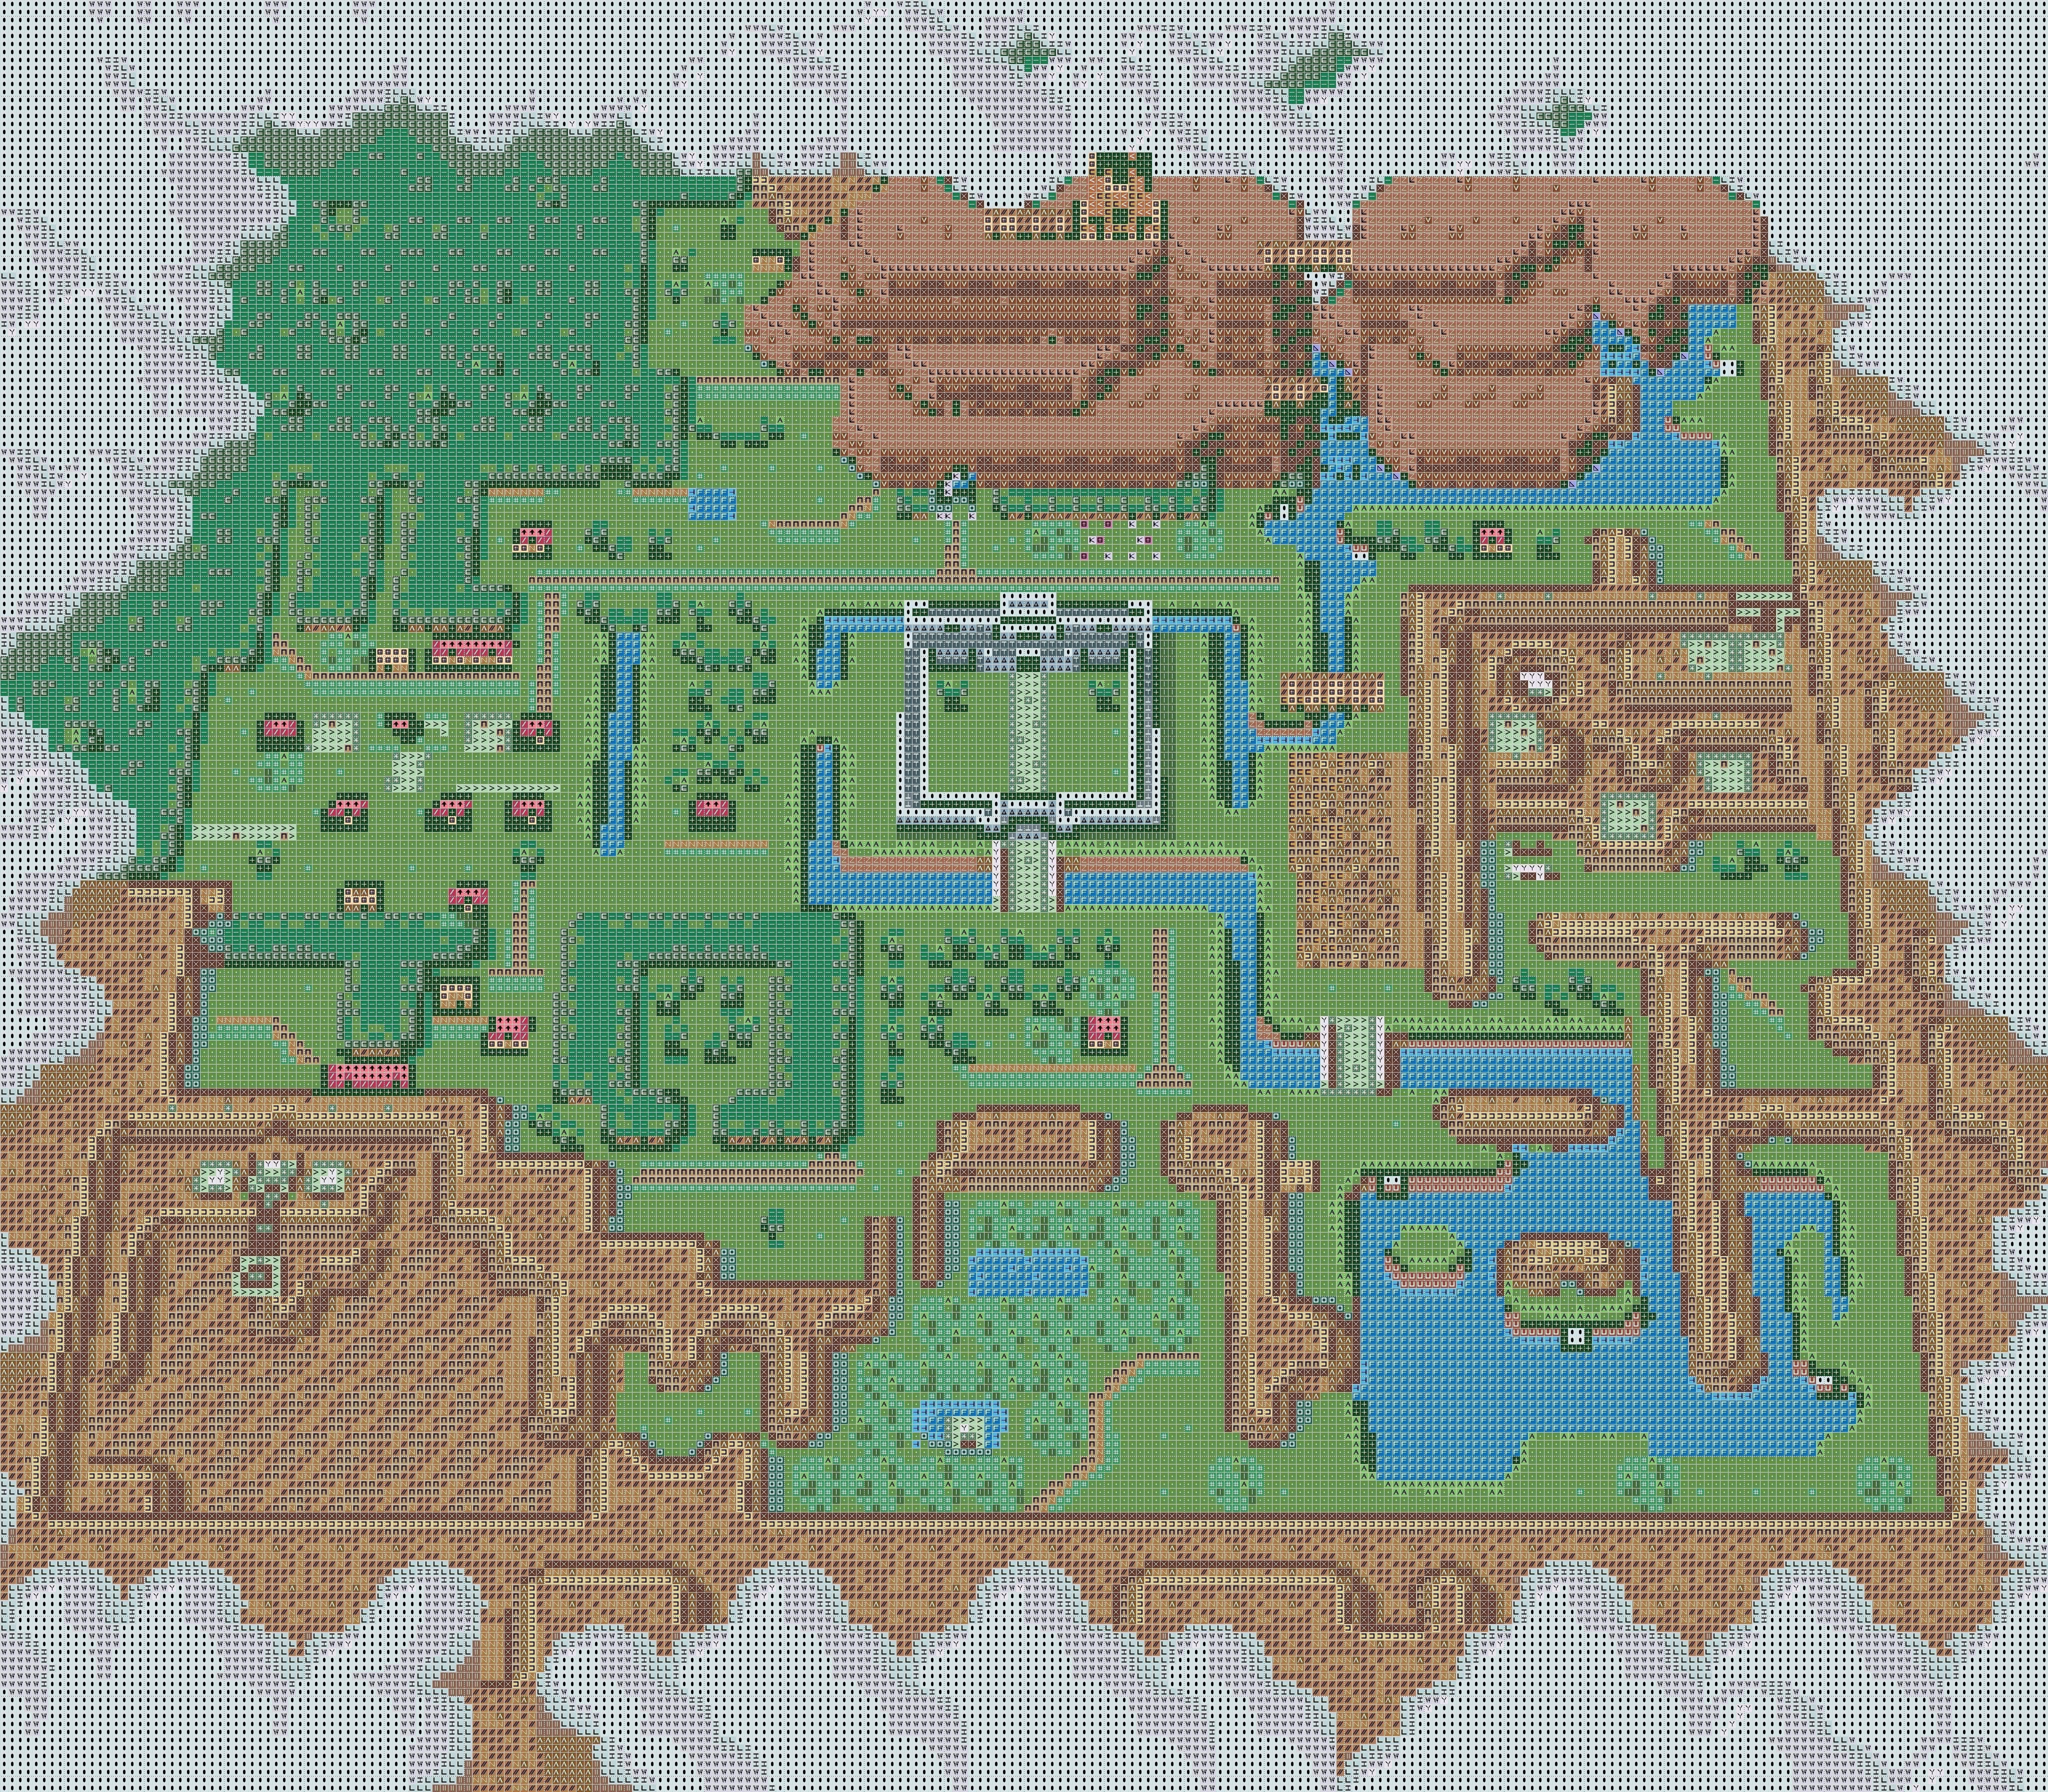 View Topic Zelda A Link To The Past Map Light World Geek Cross Stitch Cross Stitch Map Diy Cross Stitch Ideas for zelda link to past map